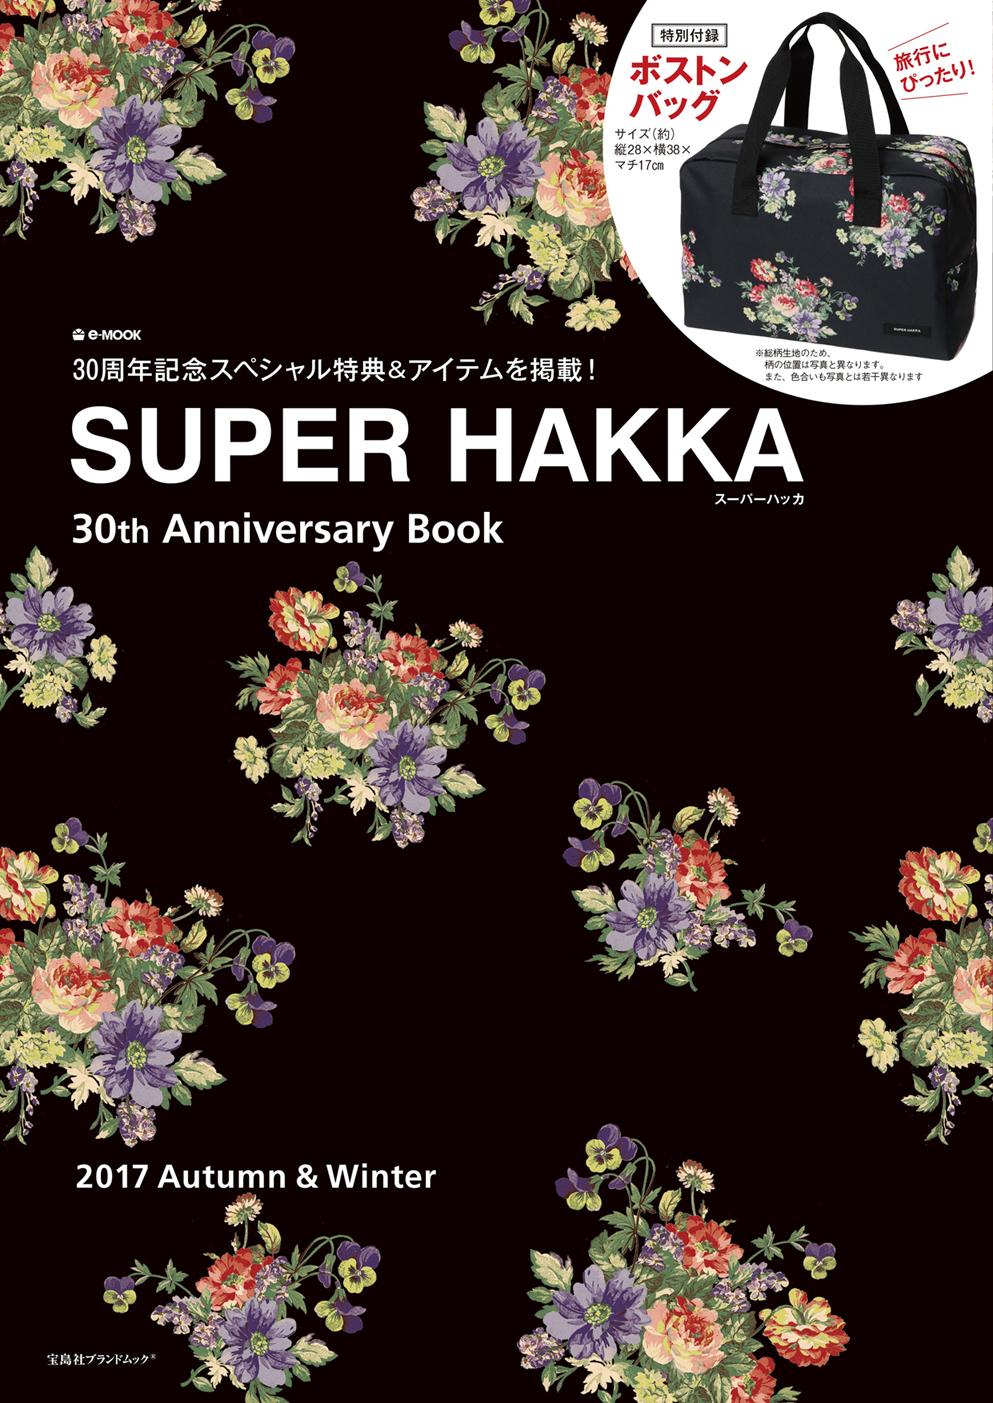 e-MOOK「SUPER HAKKA 30th Anniversary Book」特別付録&ミニカタログ(特典付き)